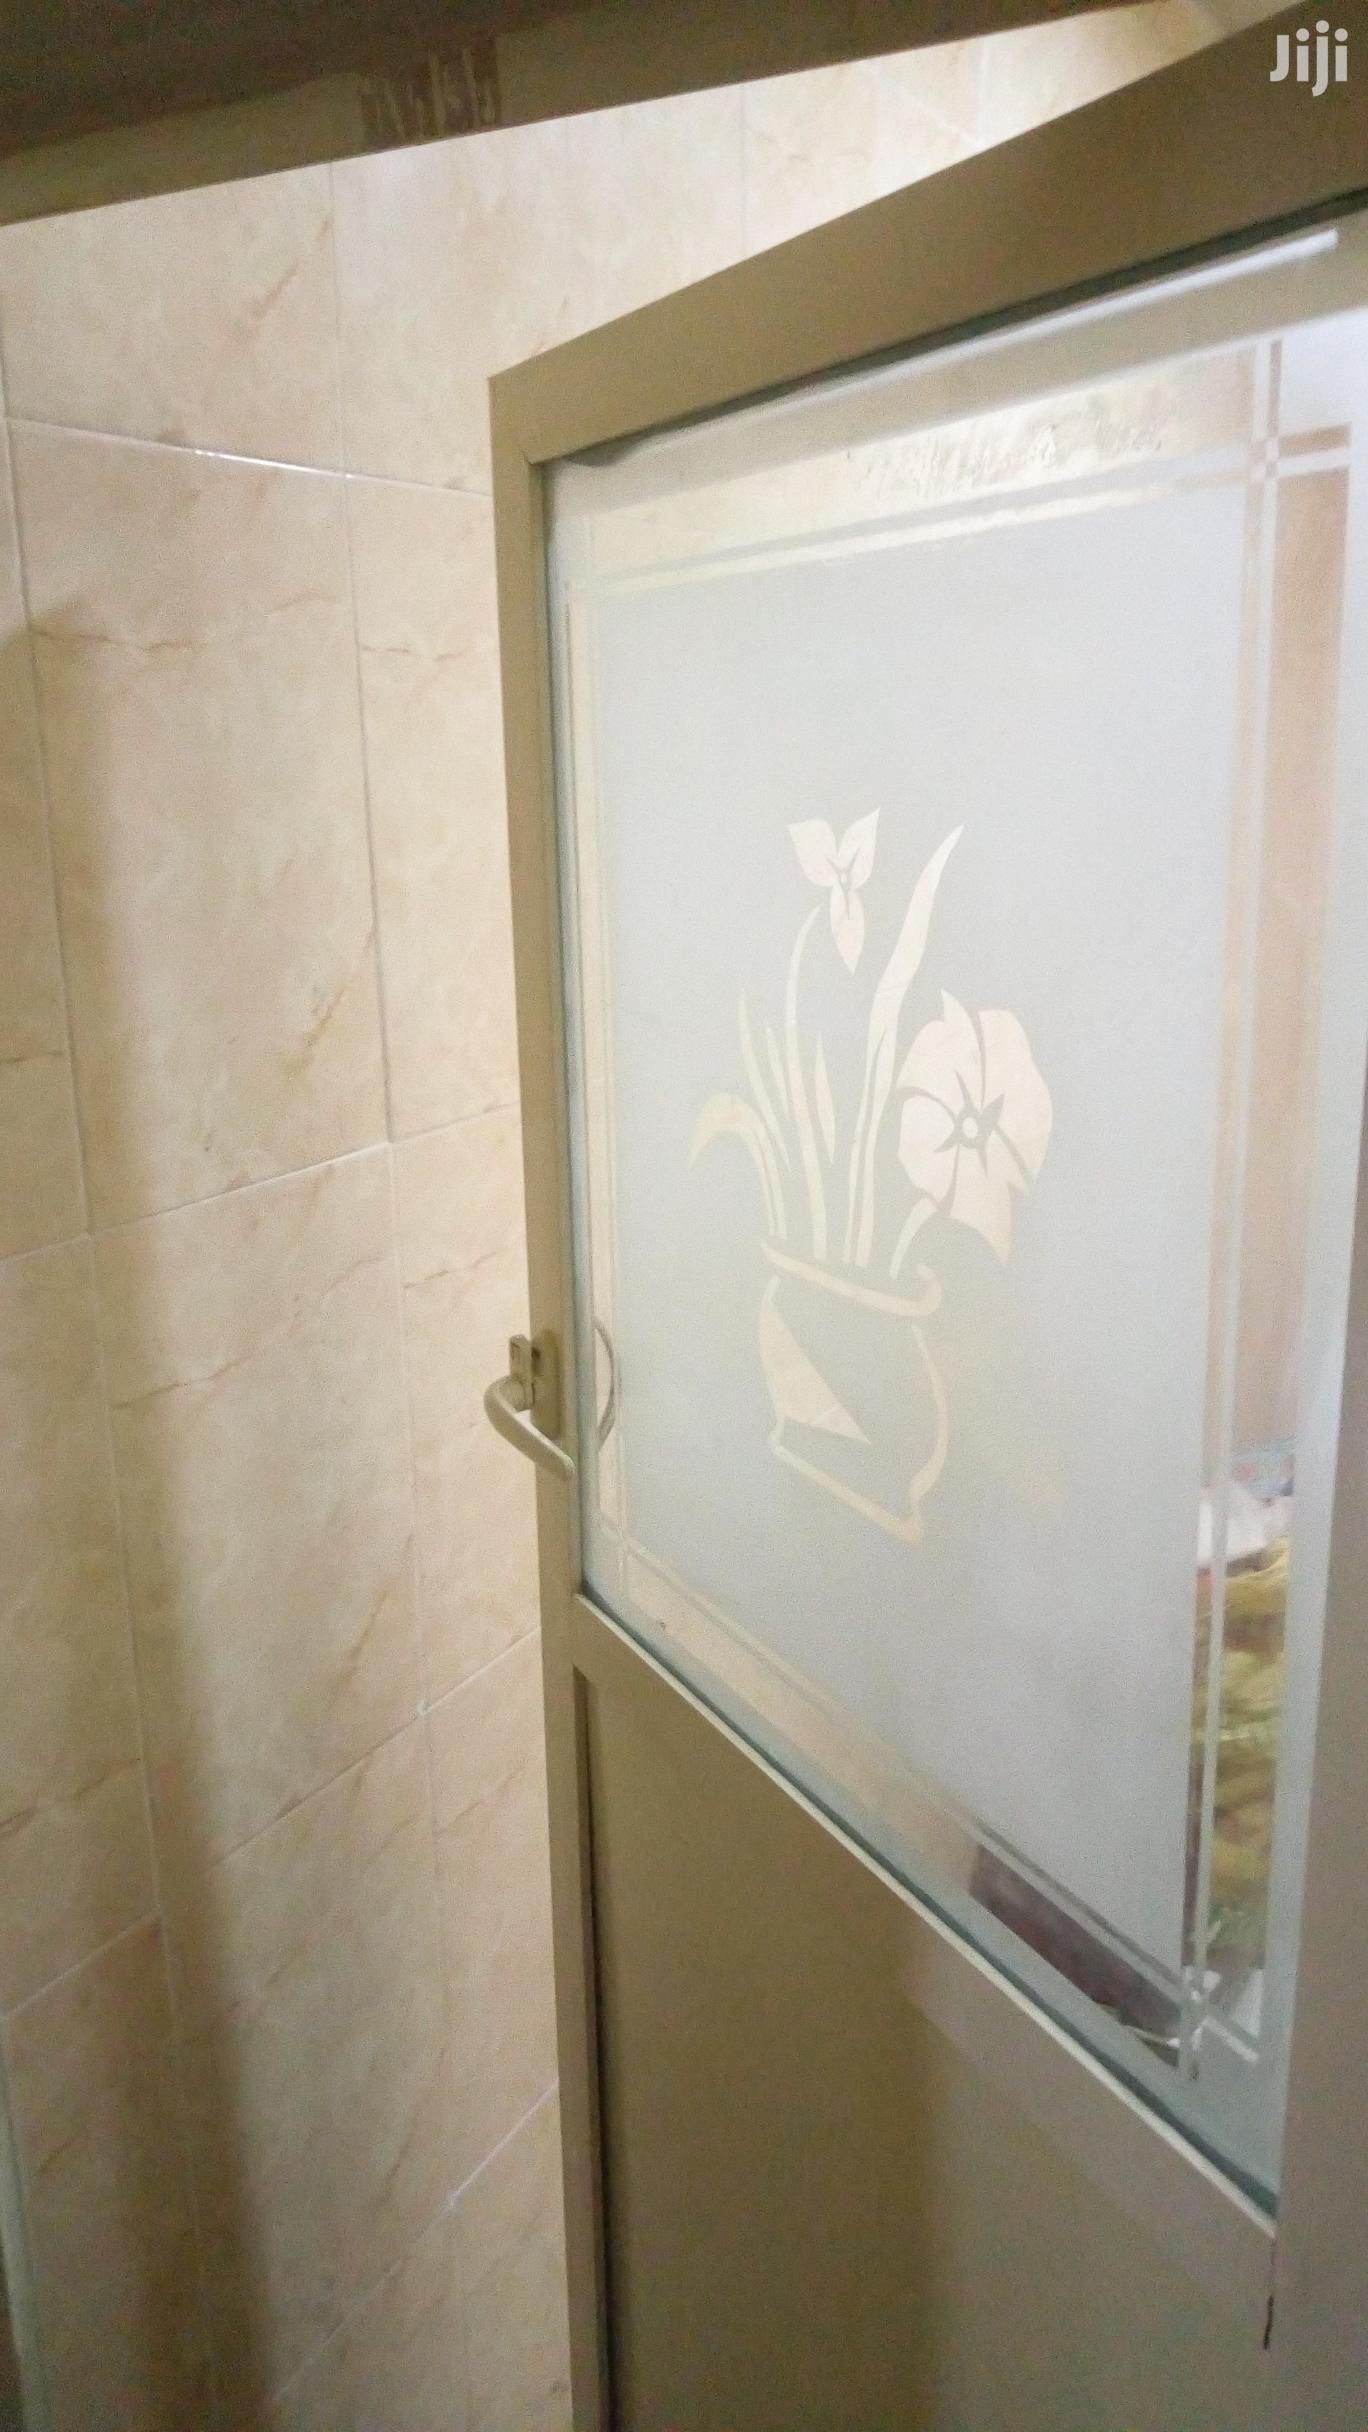 Toilet/Bathroom Door (Water Proof) | Building & Trades Services for sale in Alimosho, Lagos State, Nigeria